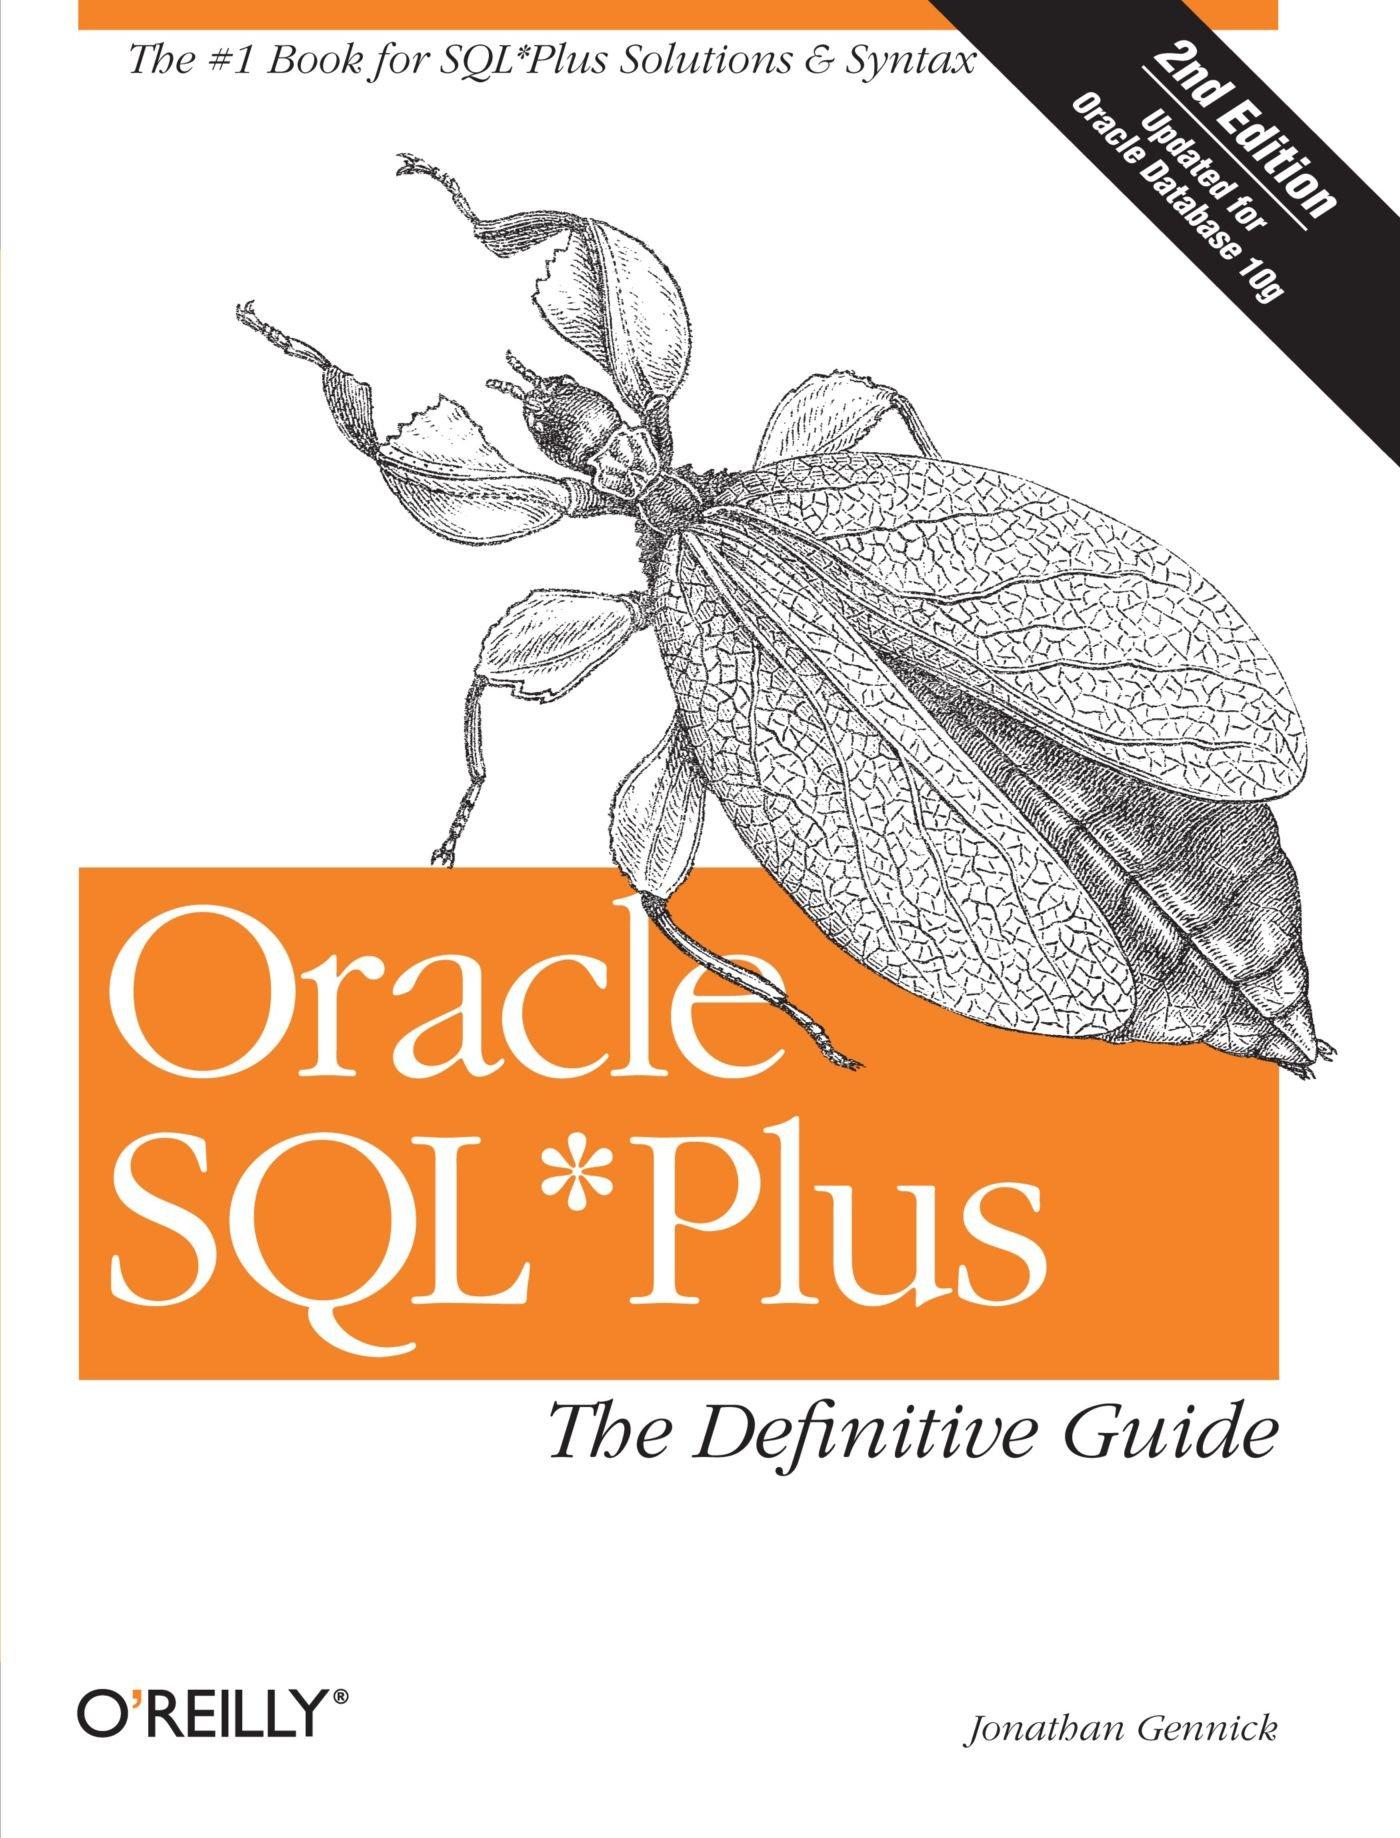 Oracle SQL*Plus: The Definitive Guide (Definitive Guides) pdf